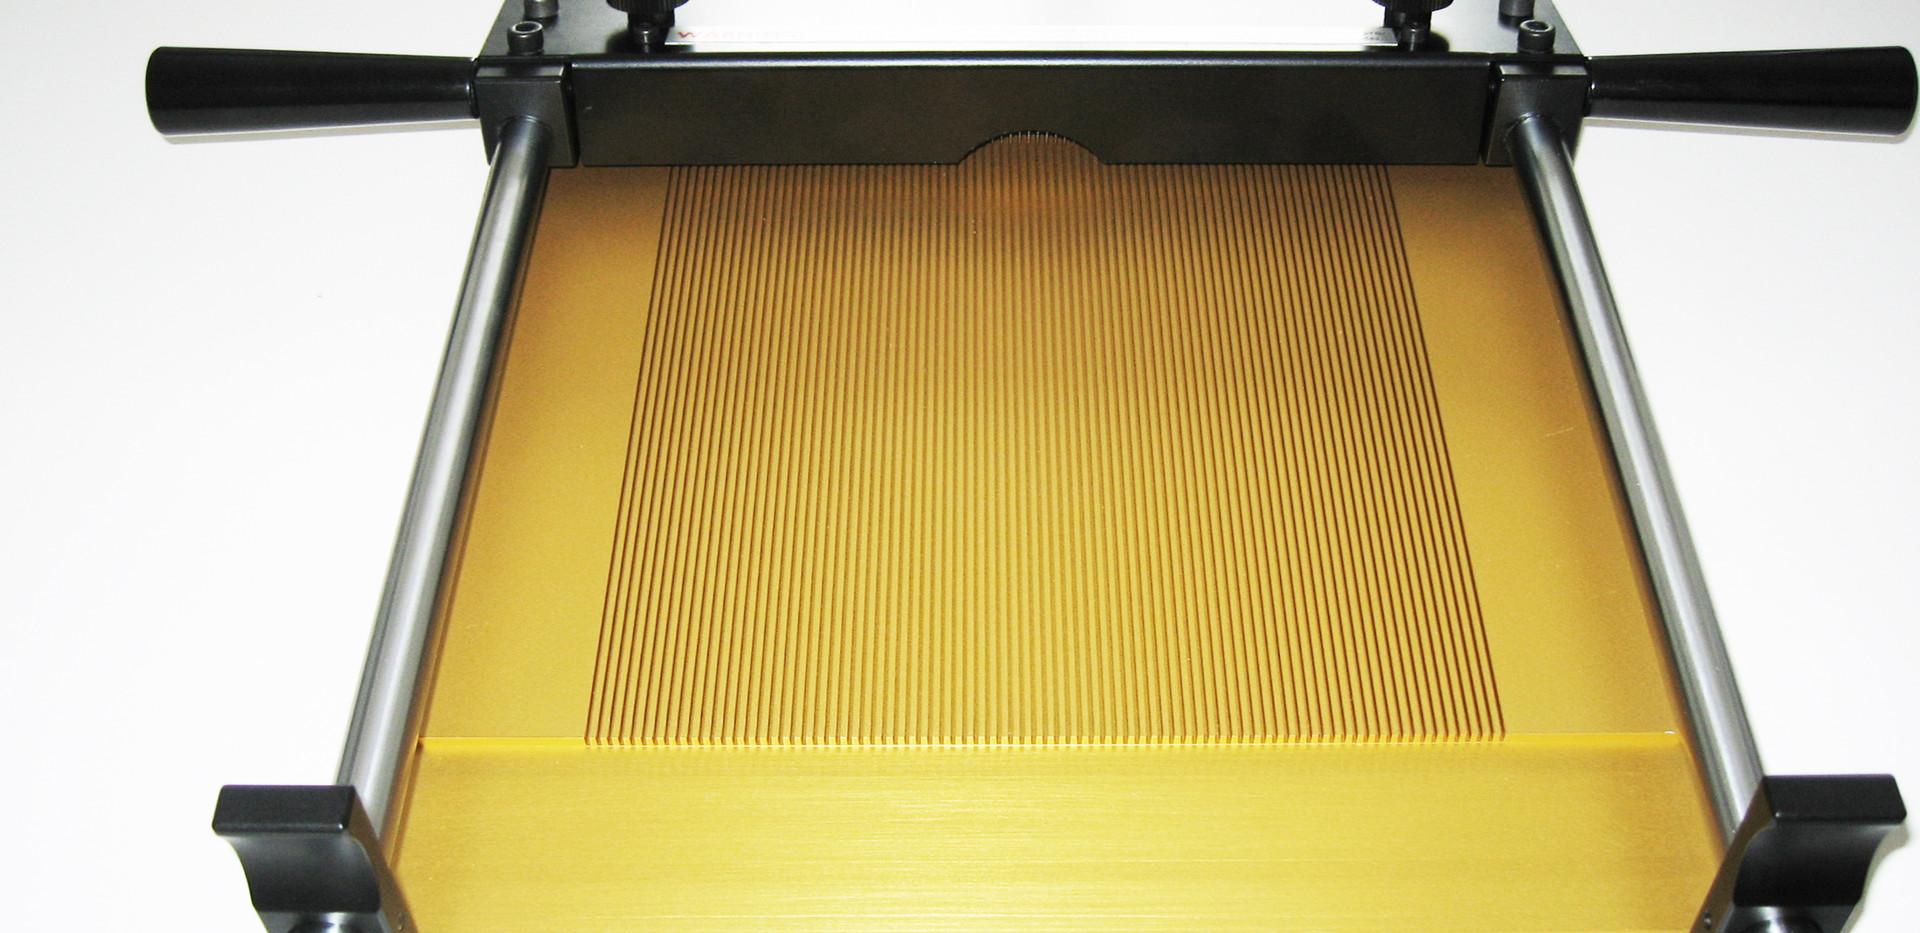 01 Accutran Strip Cutter_1.jpg